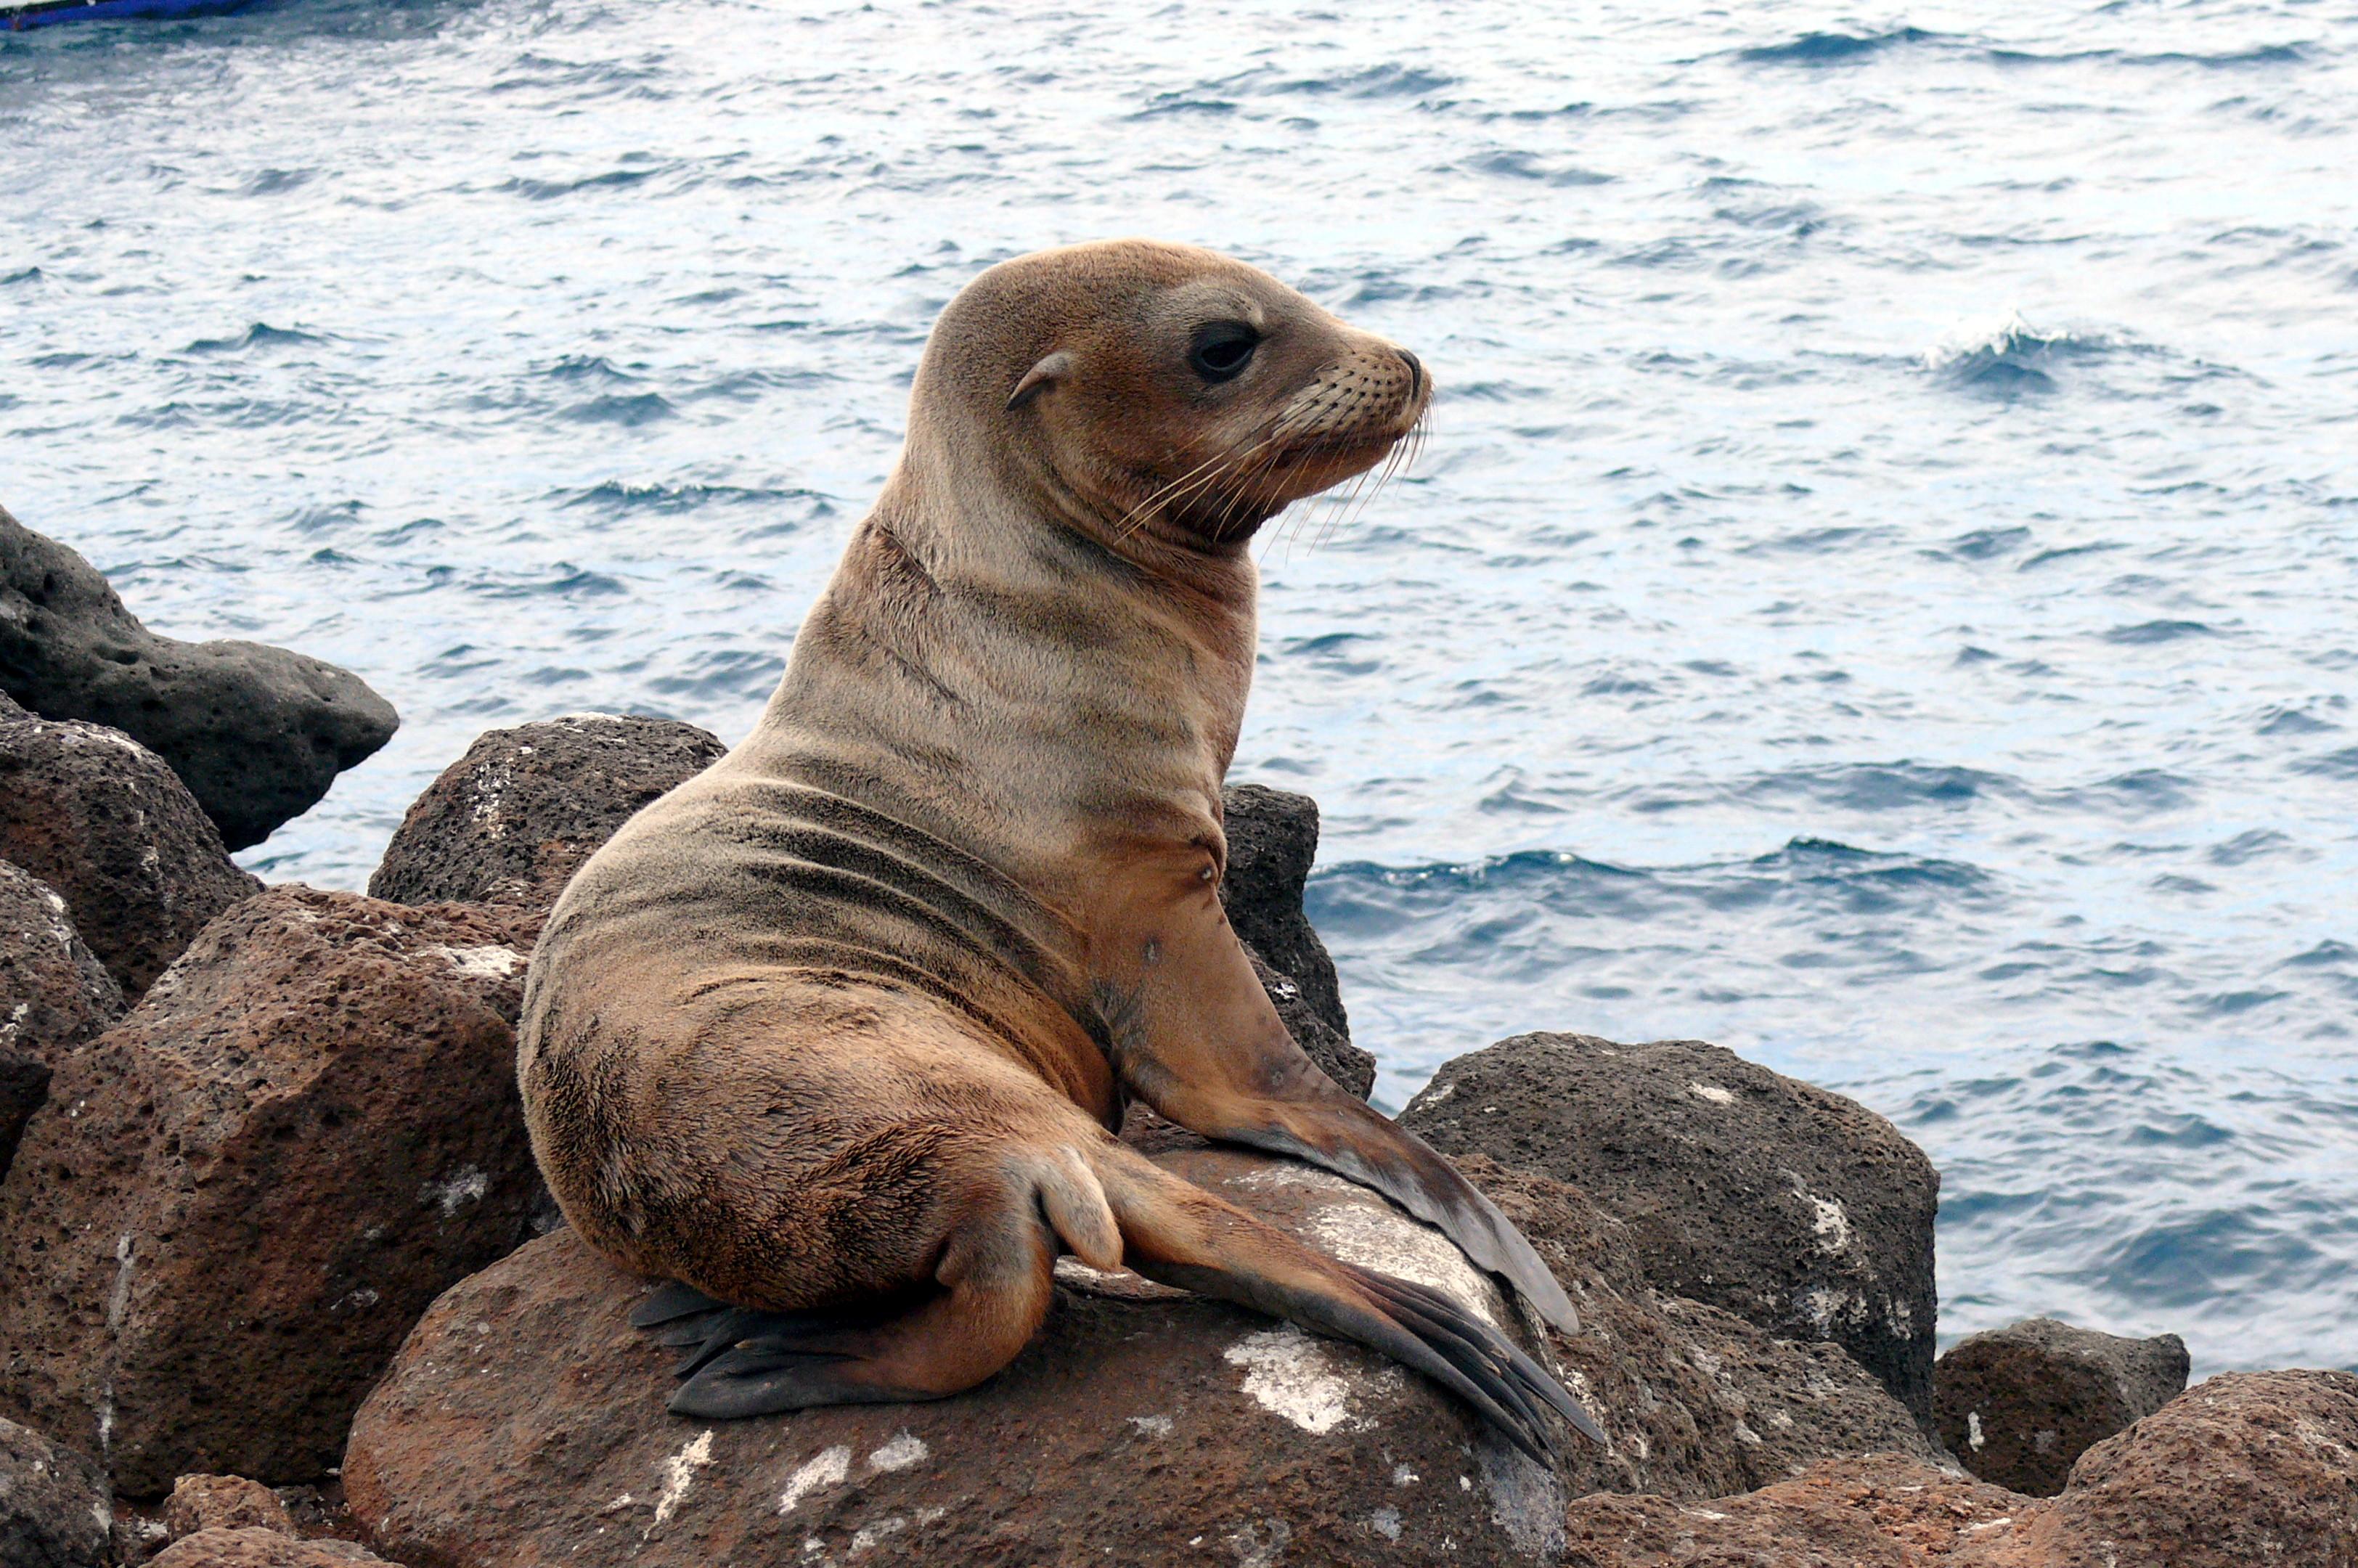 Sea lion cub